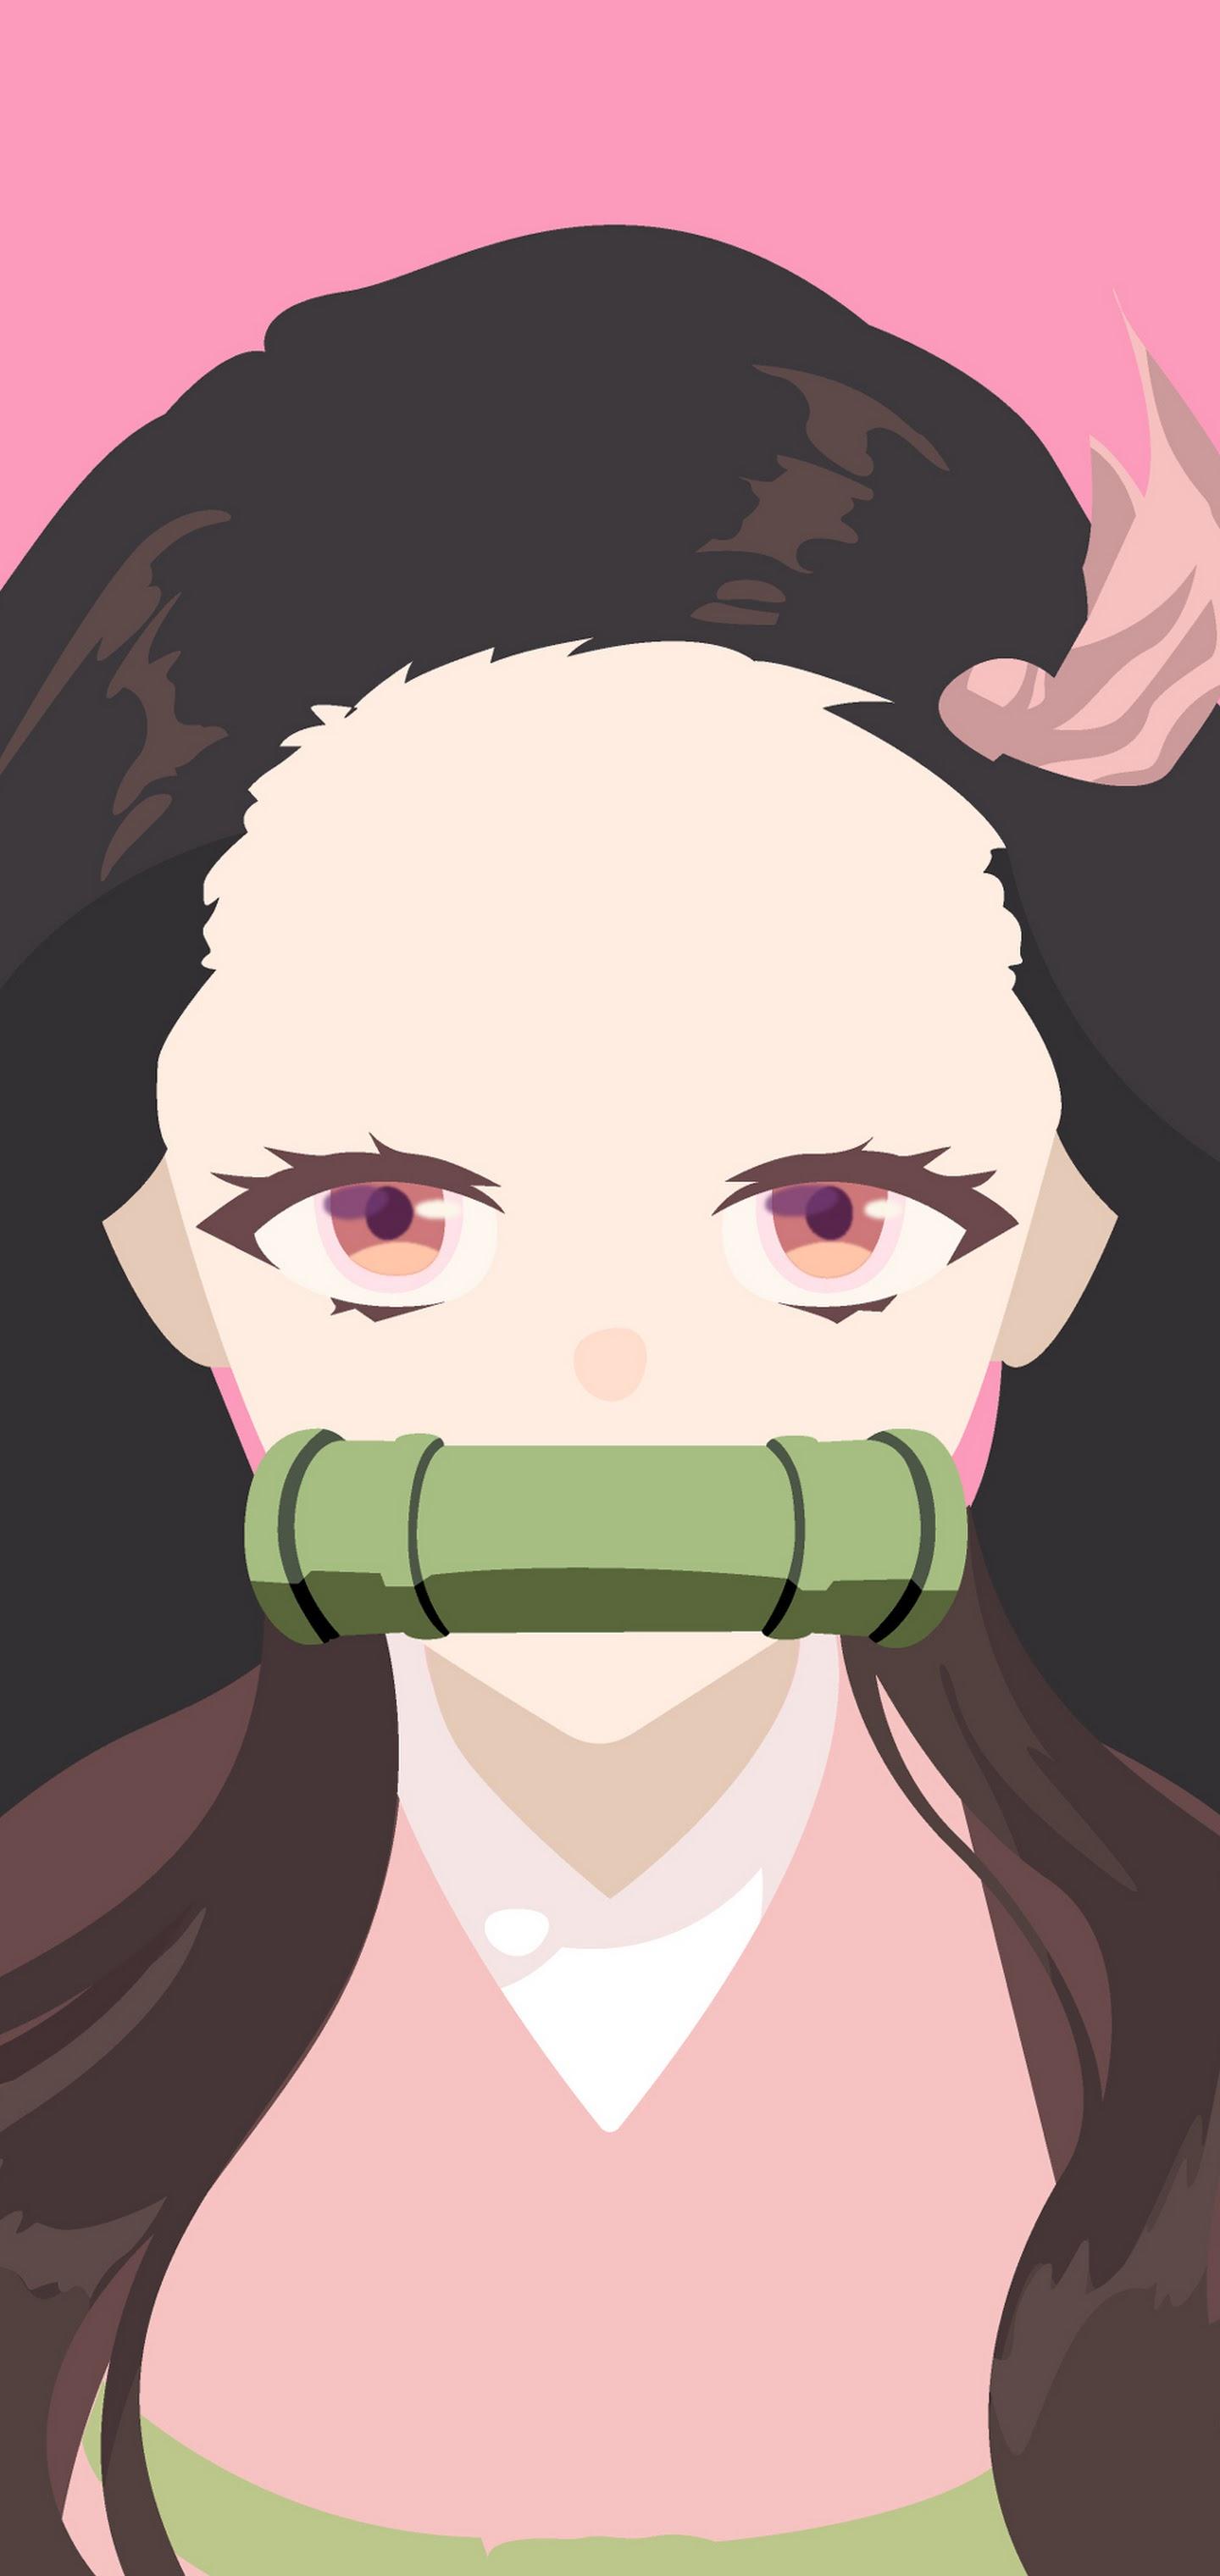 Nezuko Kamado, Kimetsu No Yaiba, Minimalist, 4k, - Kimetsu No Yaiba Nezuko - HD Wallpaper